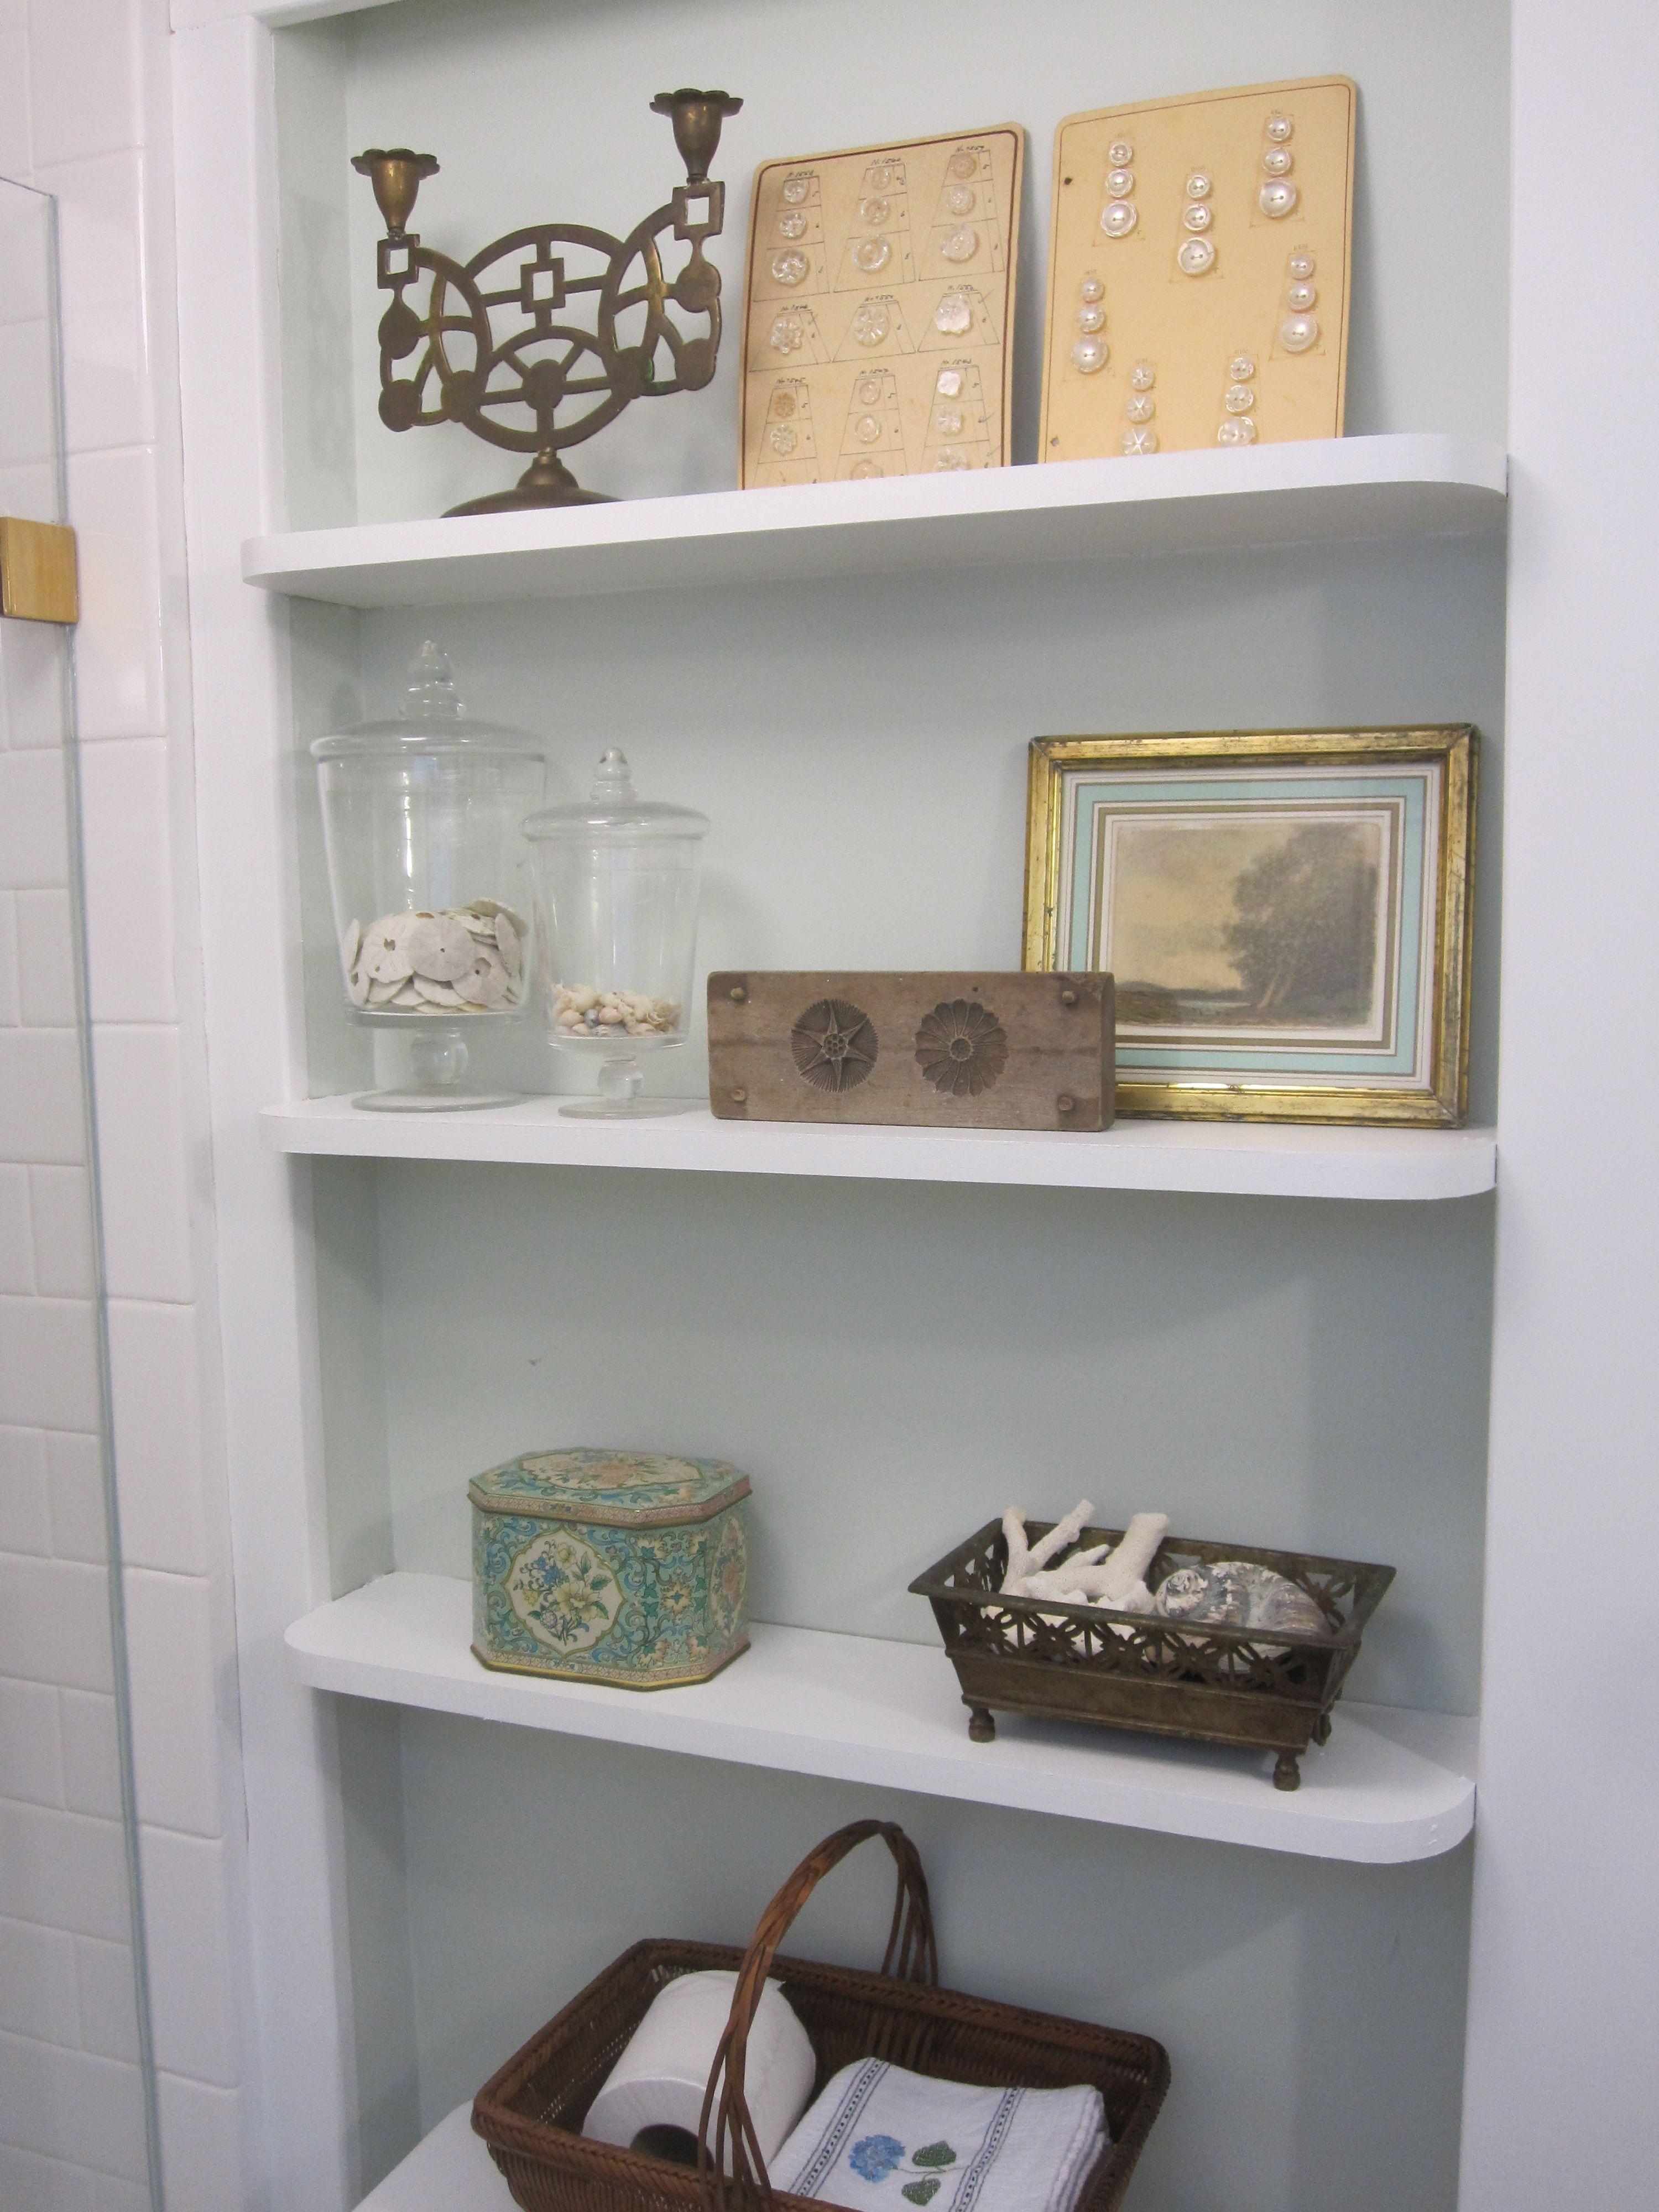 White Recessed Bathroom Shelves For Small Bathroom Storage Solution ...